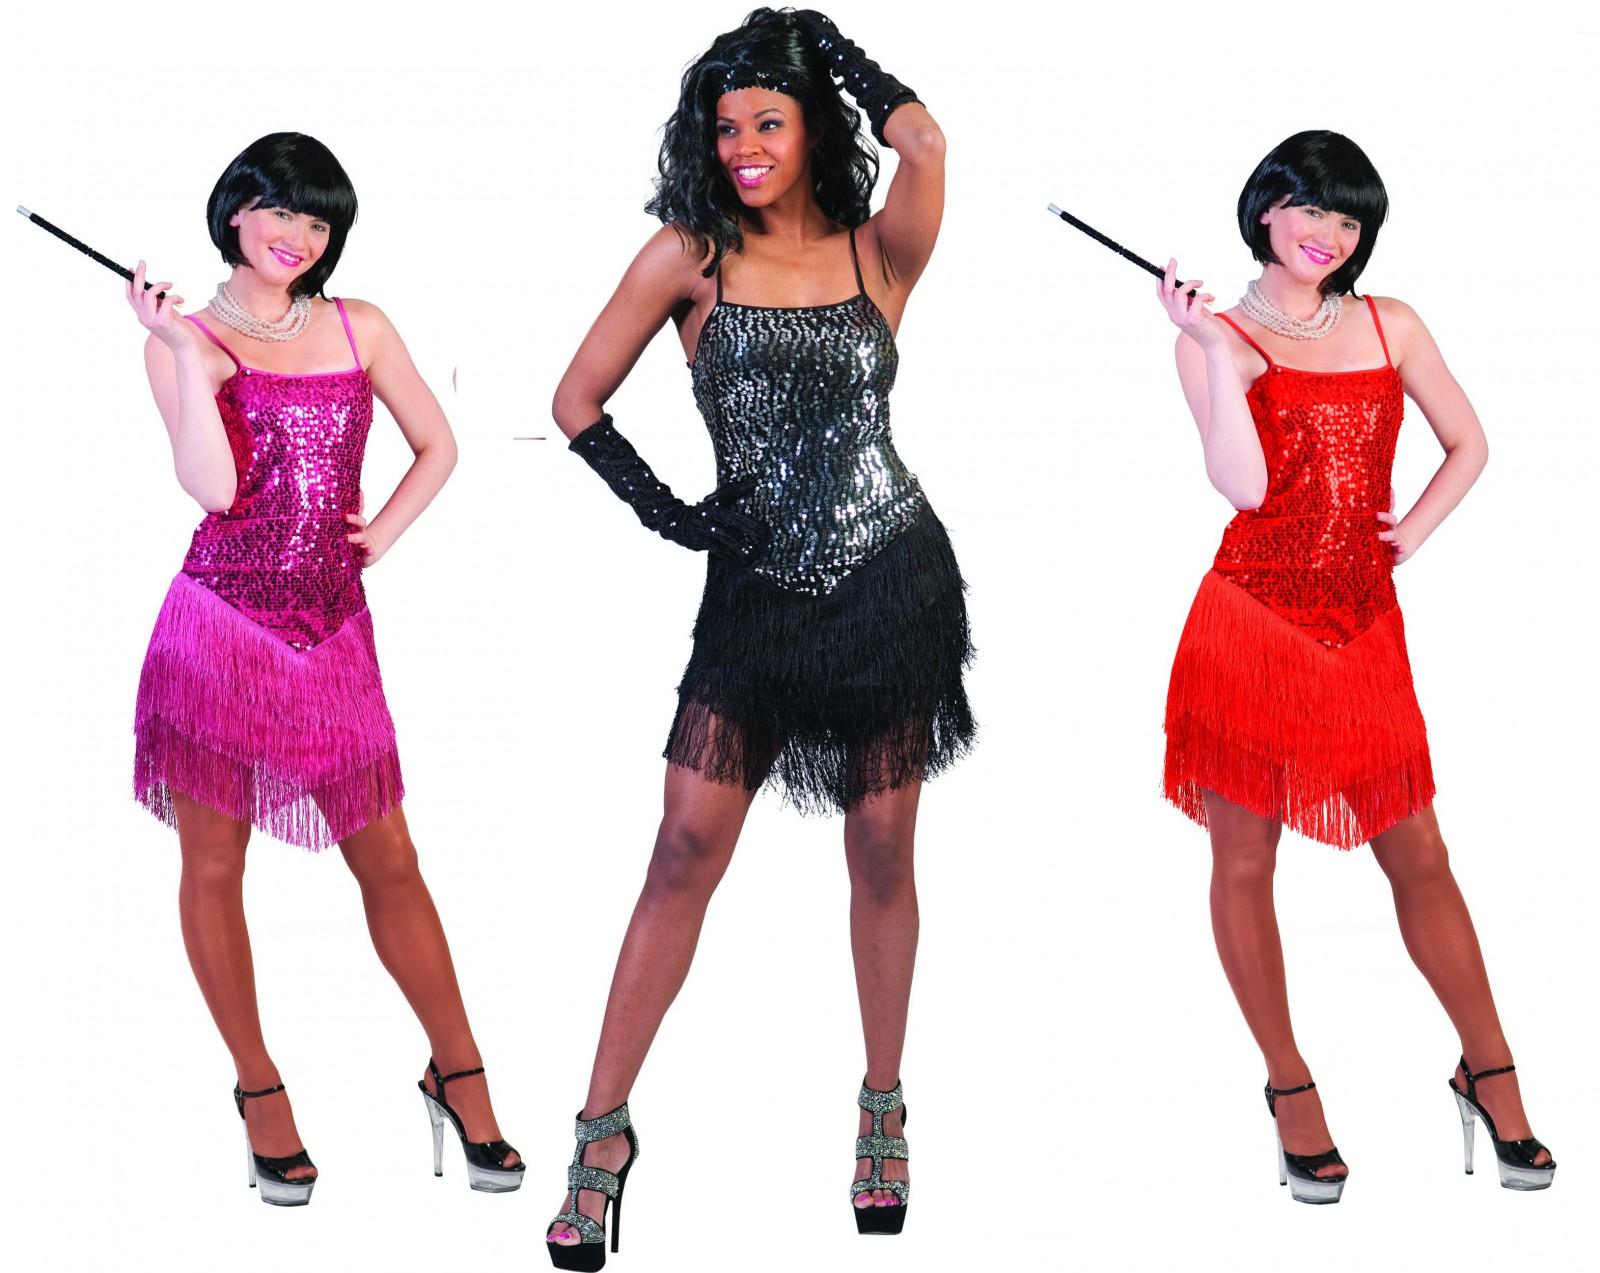 f62e06c2564b5 Damen Kostüm Paillettenkleid Glitzerkleid Disco Party 20er Gr.32-46 Karneval